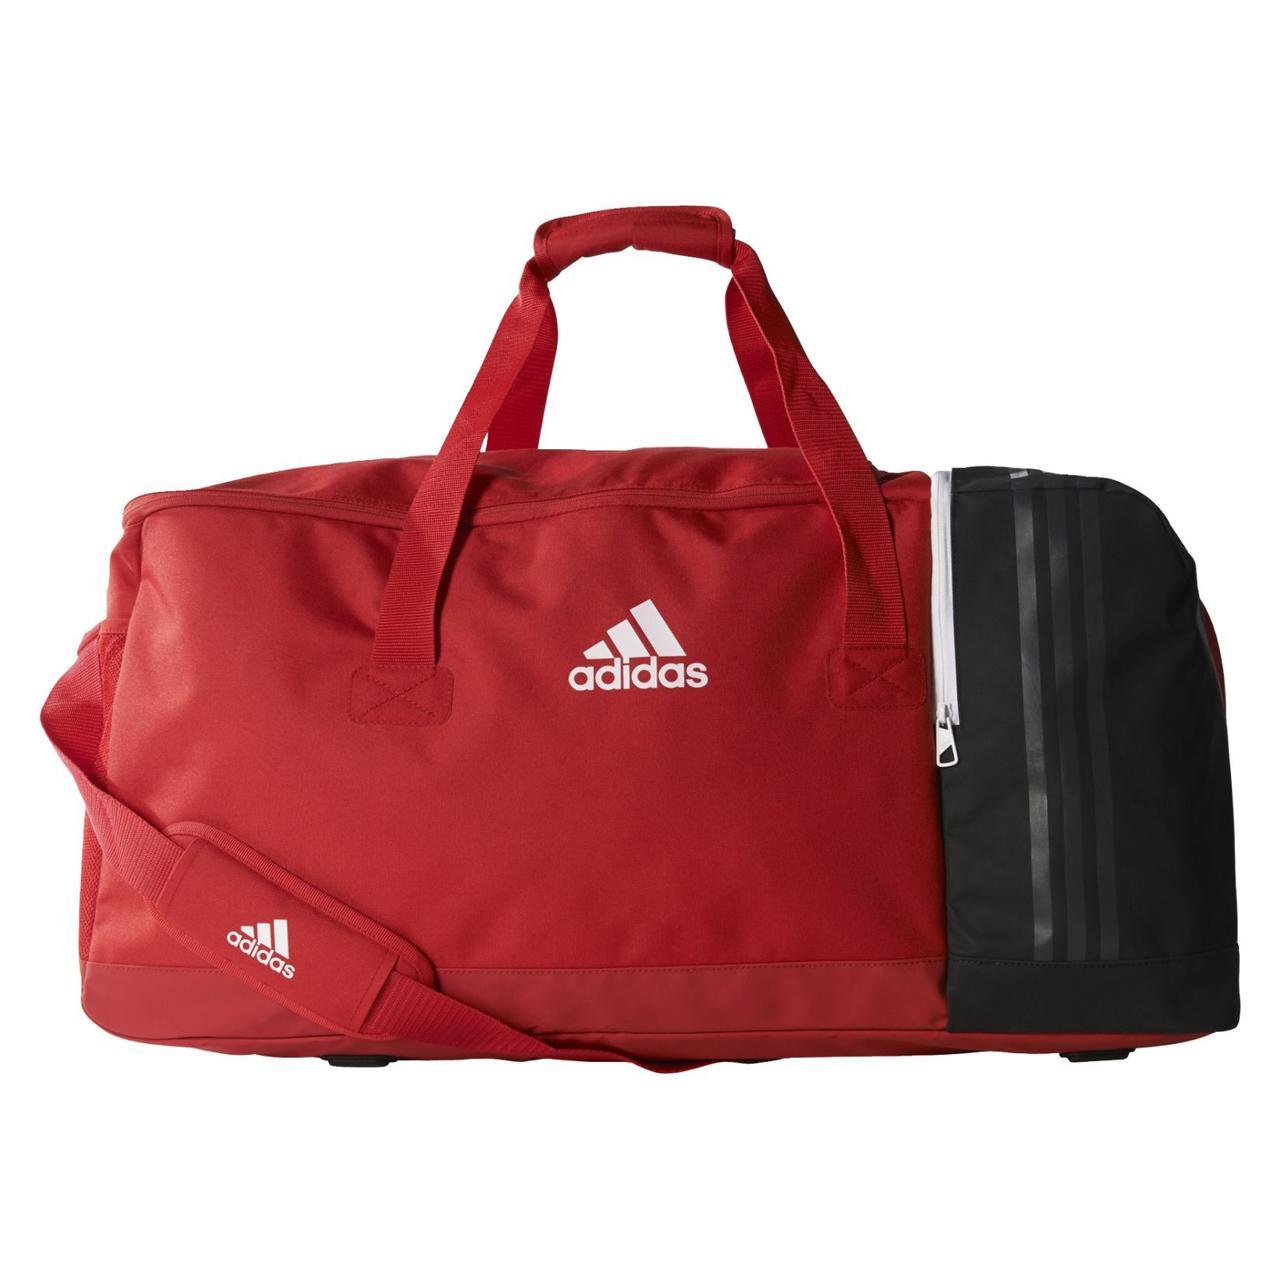 f41ac33dc4cd Спортивная сумка Adidas Tiro Teambag L BS4744 (original) 72 л, большая,  мужская